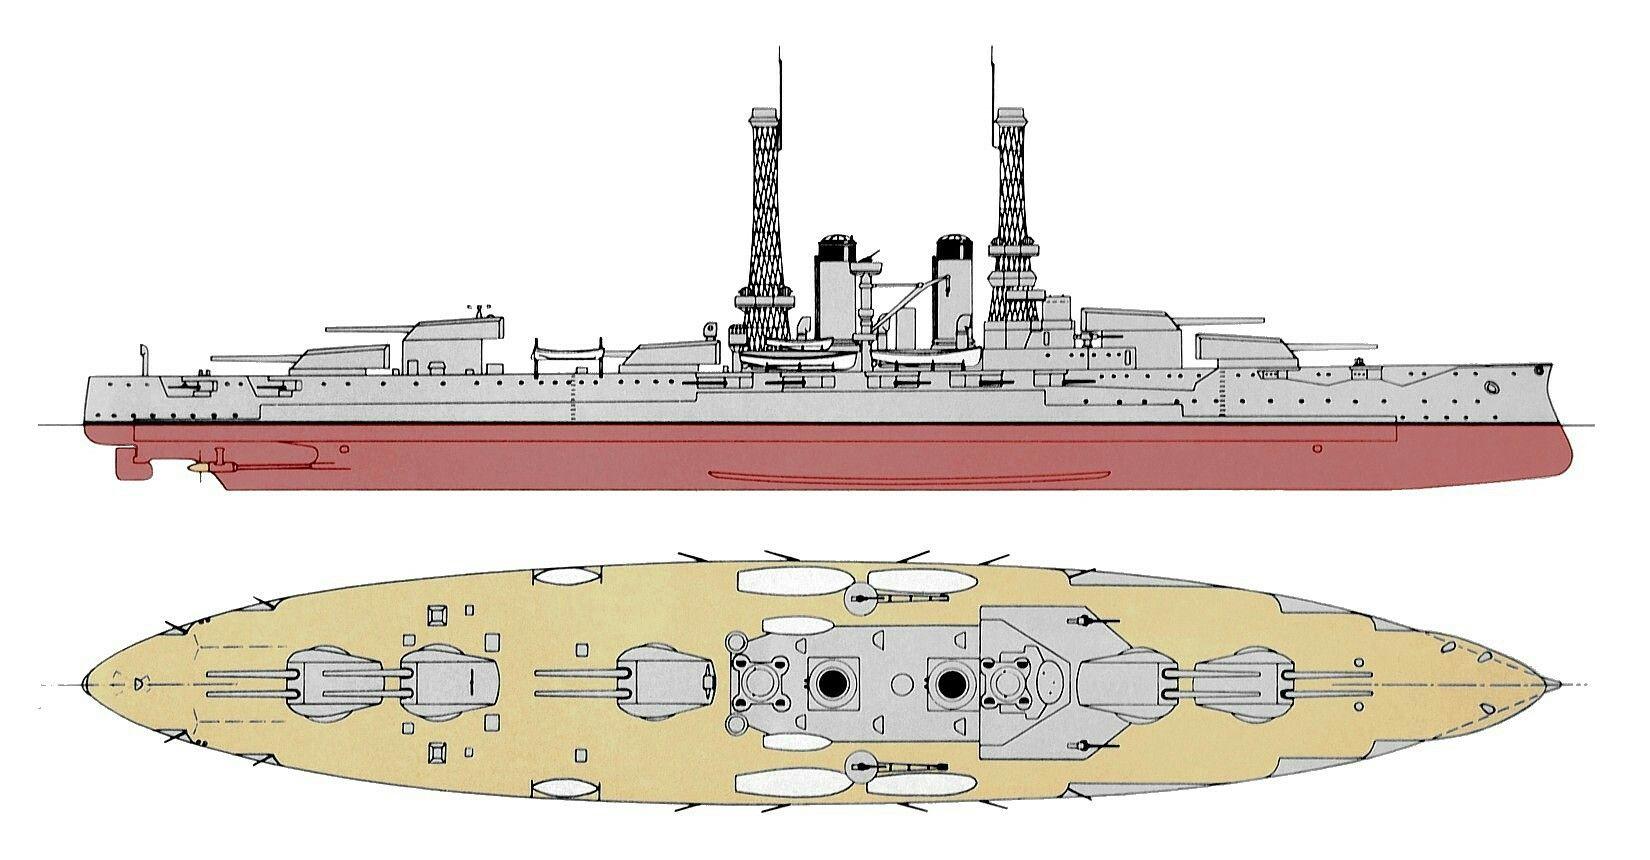 uss new york new york class battleship battleship battleship uss new york diagram [ 1650 x 860 Pixel ]